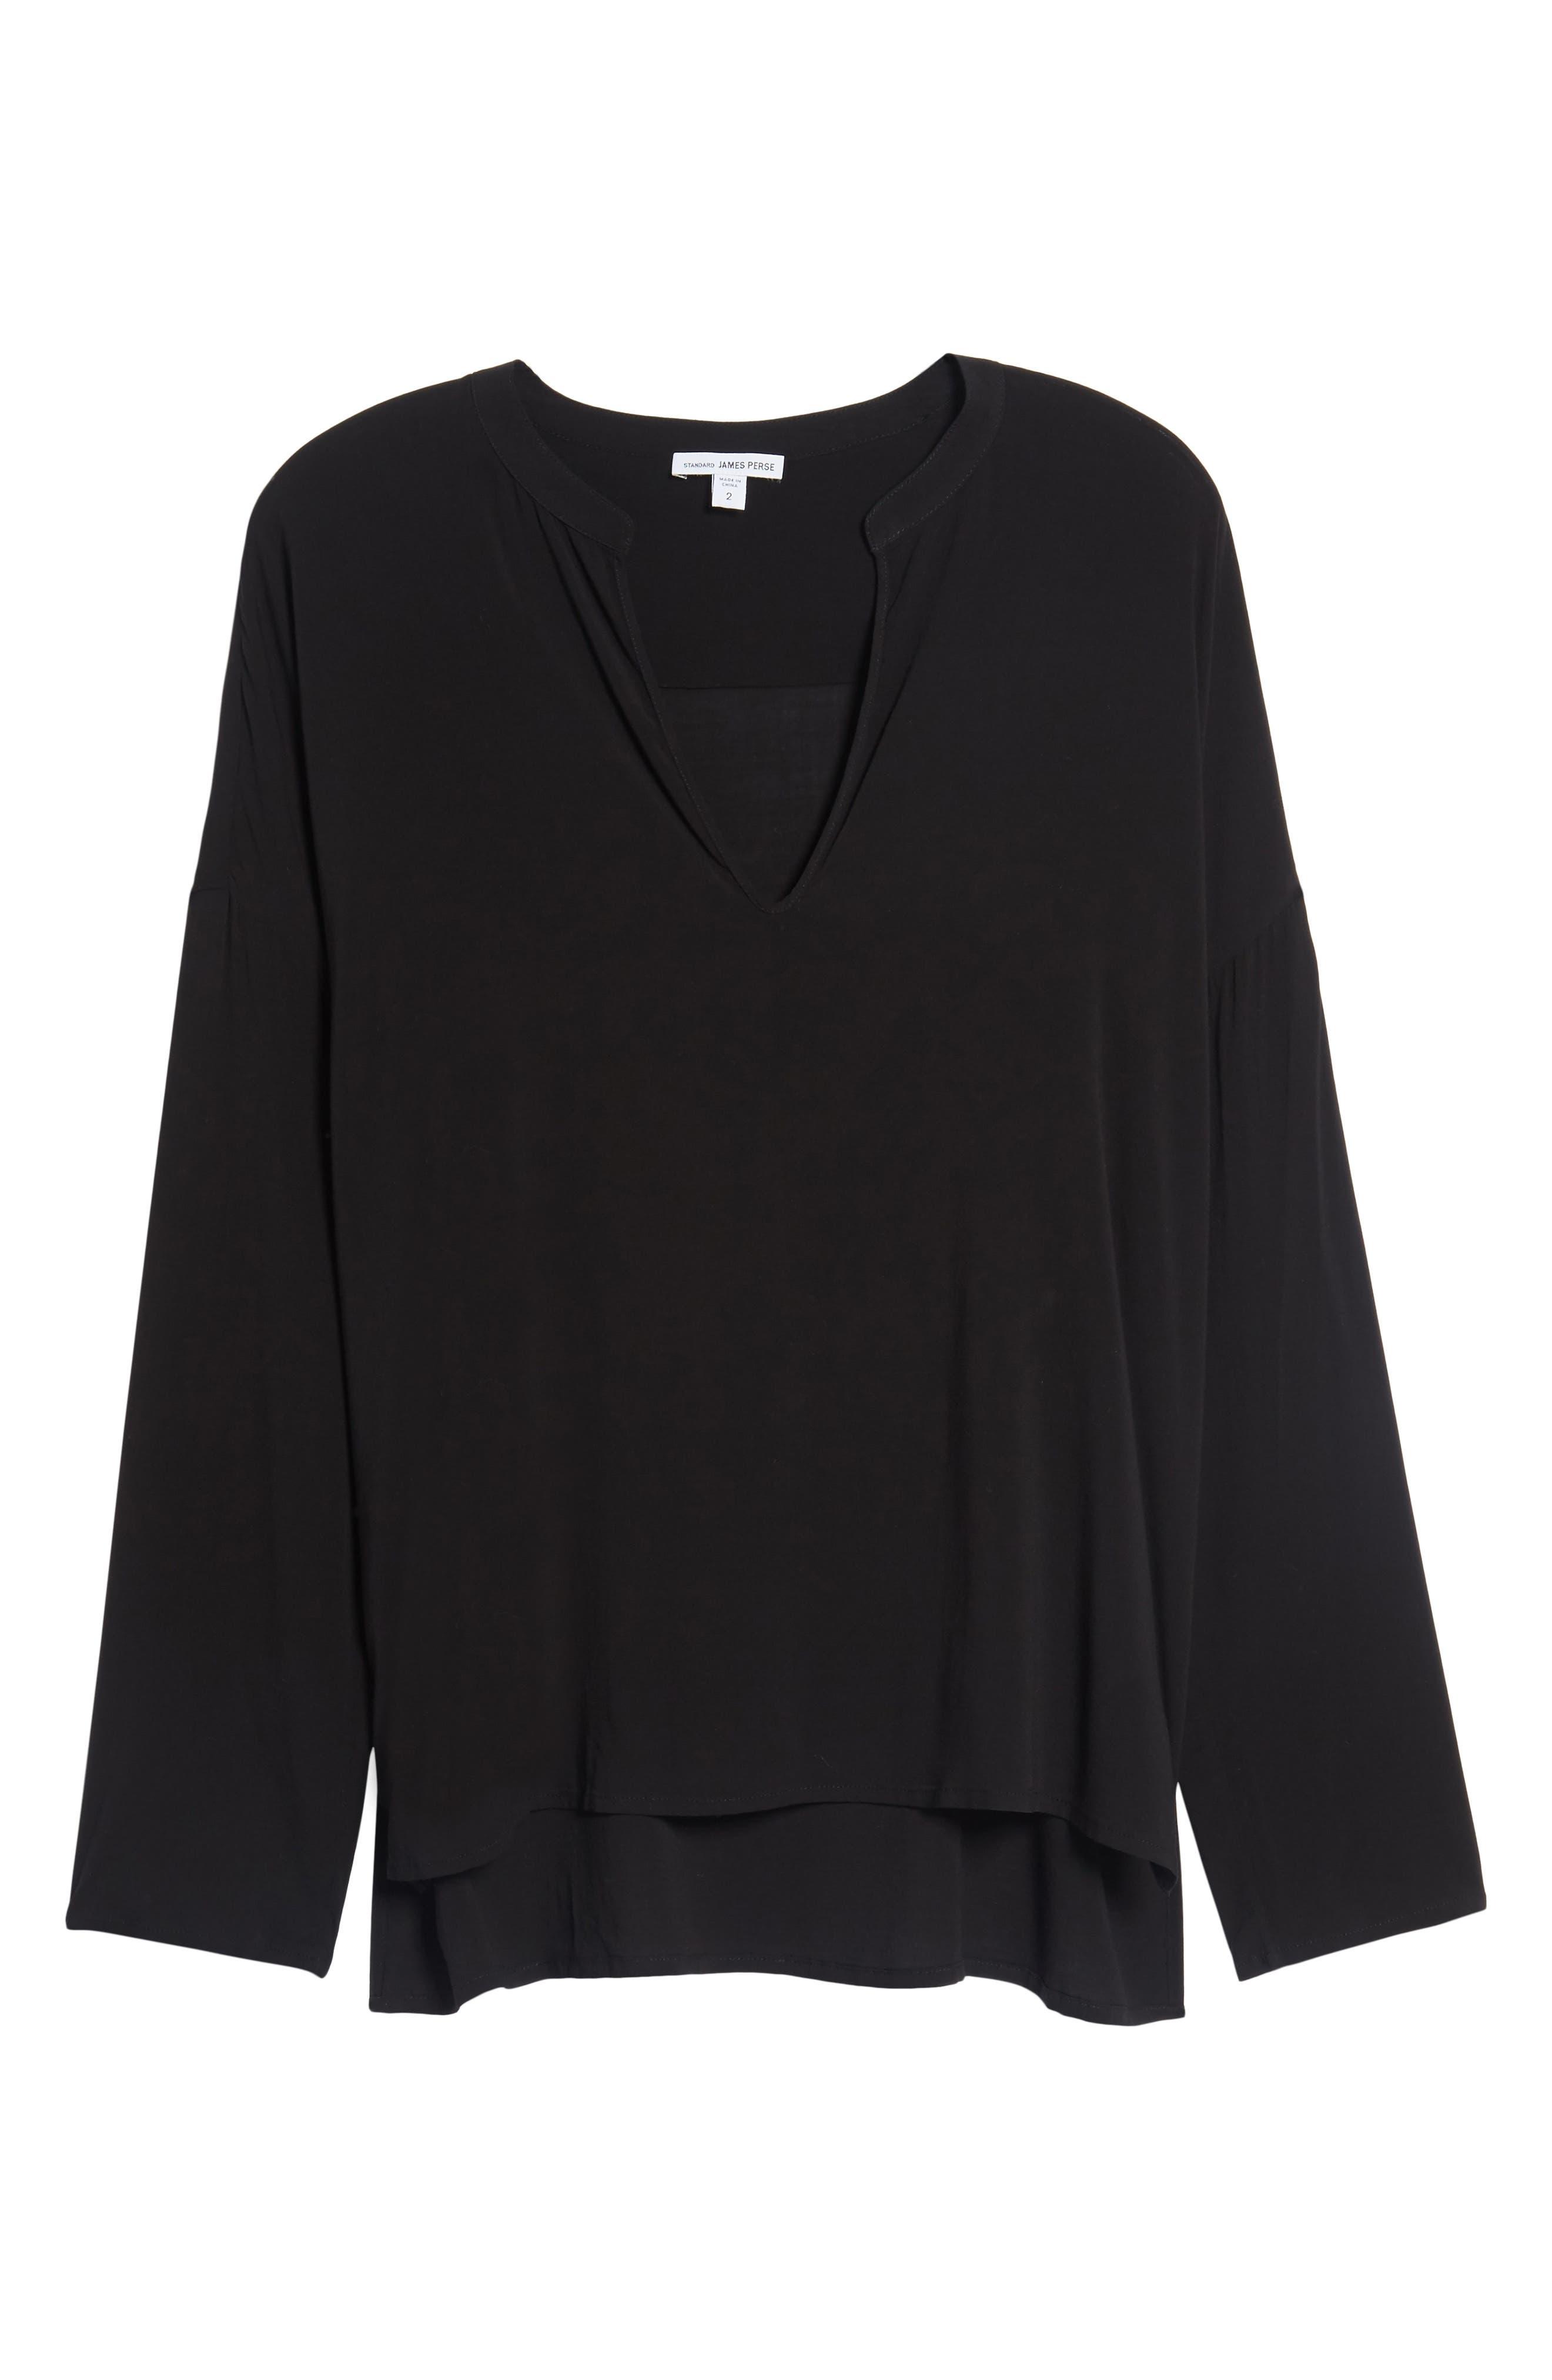 Relaxed Shirt,                             Alternate thumbnail 5, color,                             Black